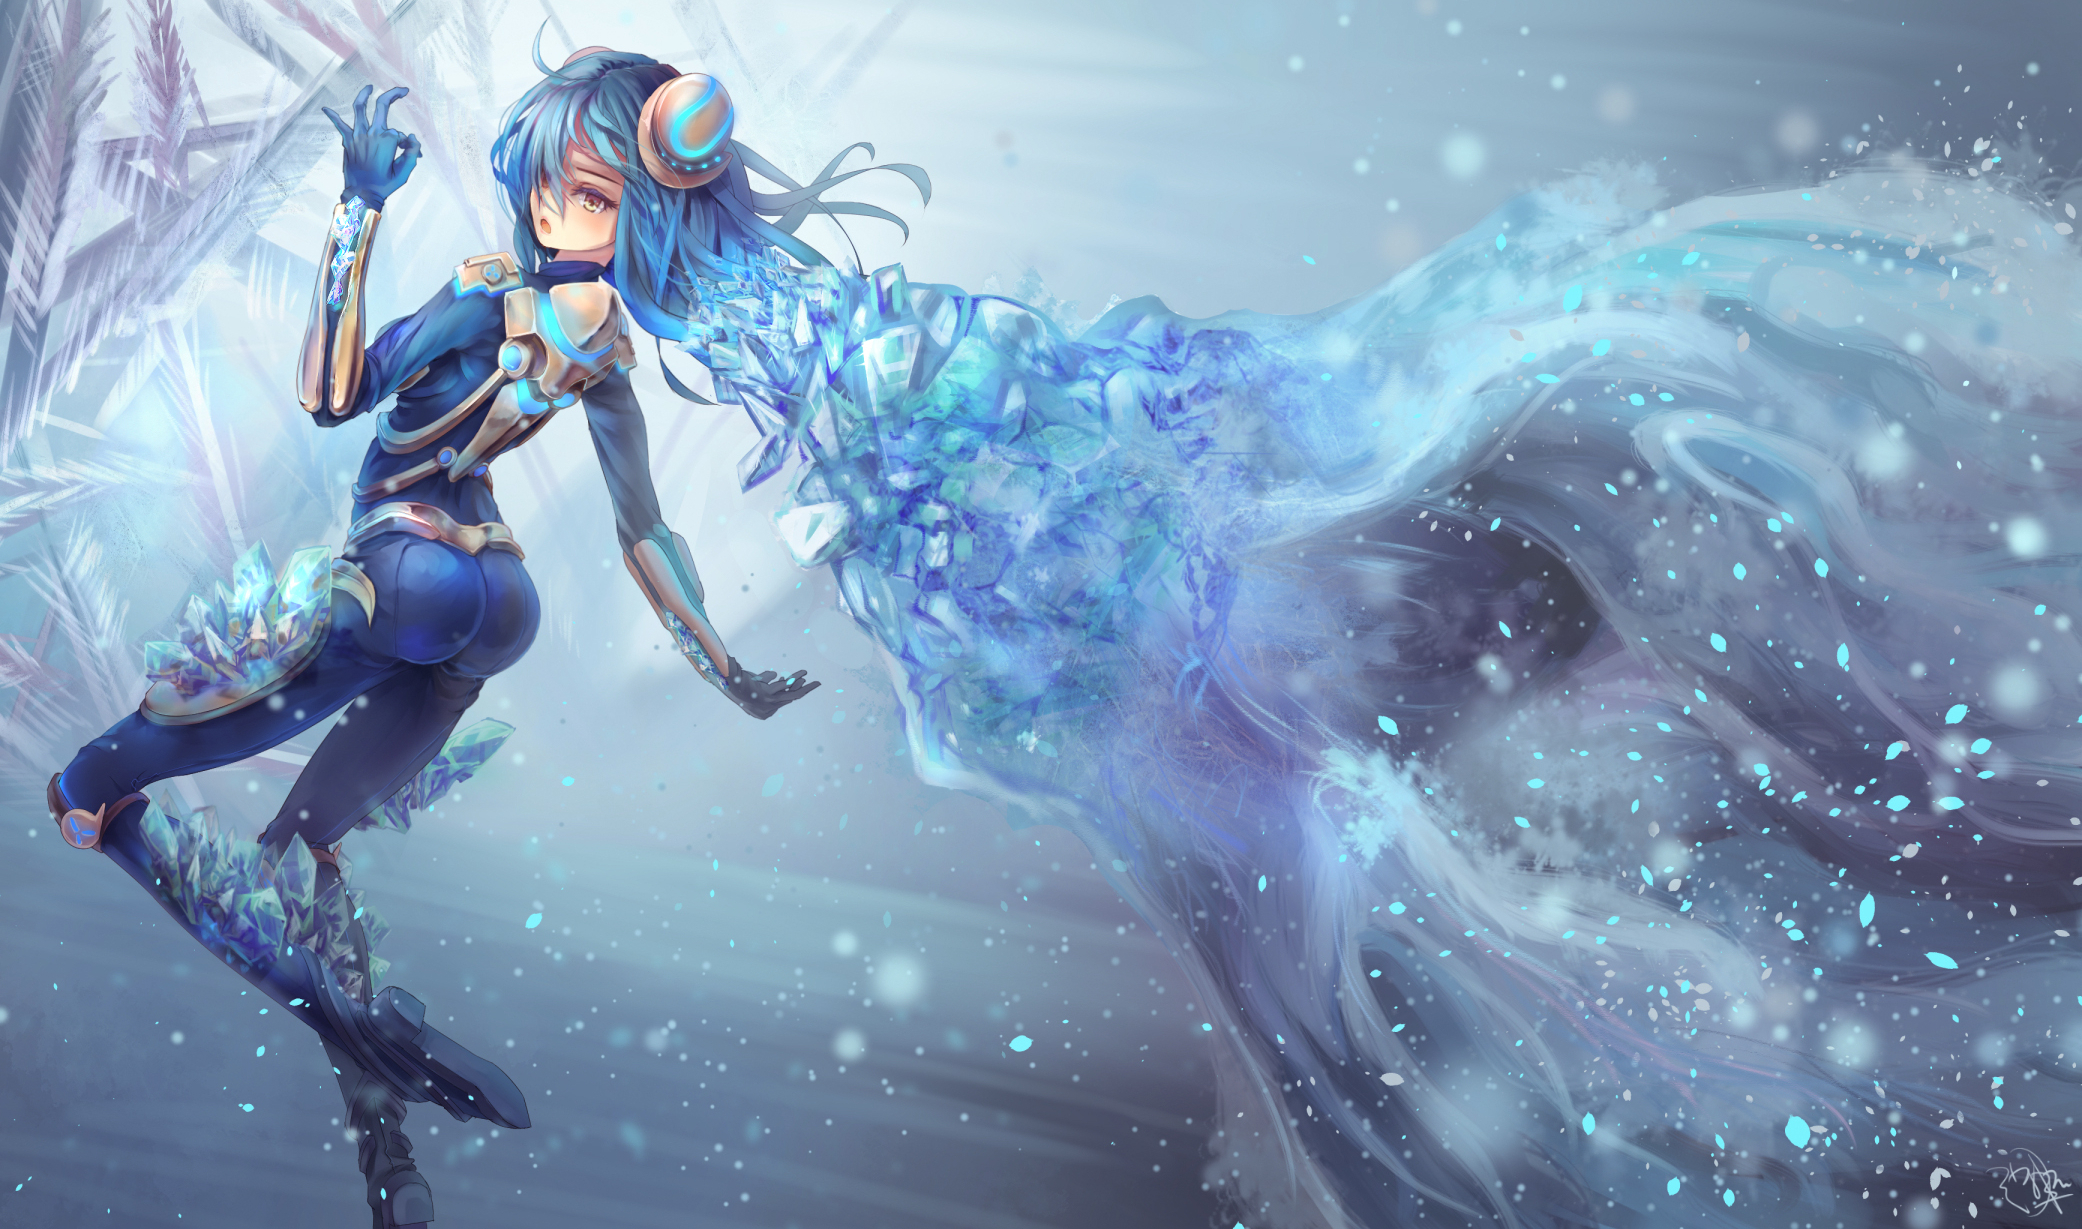 Frostblade Irelia wallpaper